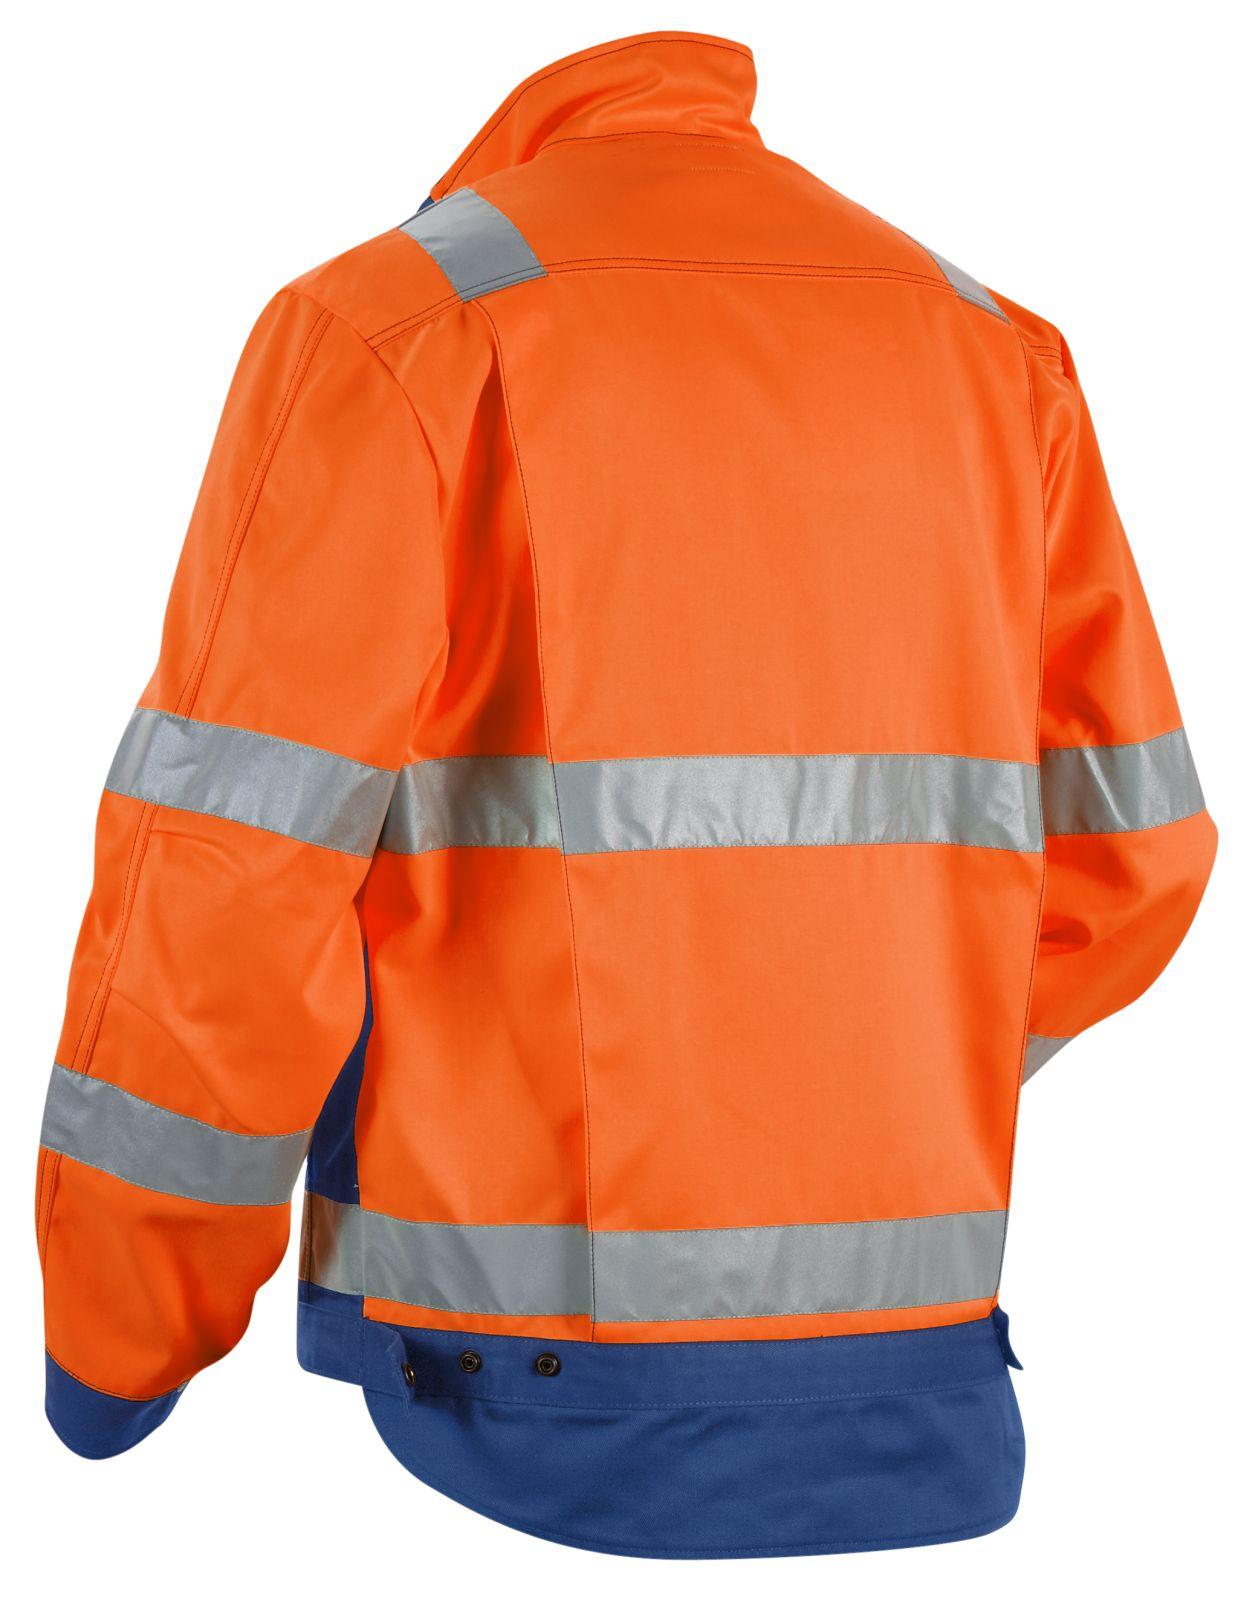 Blaklader High visual Combi-jacks 40231804 Polyester- katoen fluo oranje-kobaltblauw(5385)